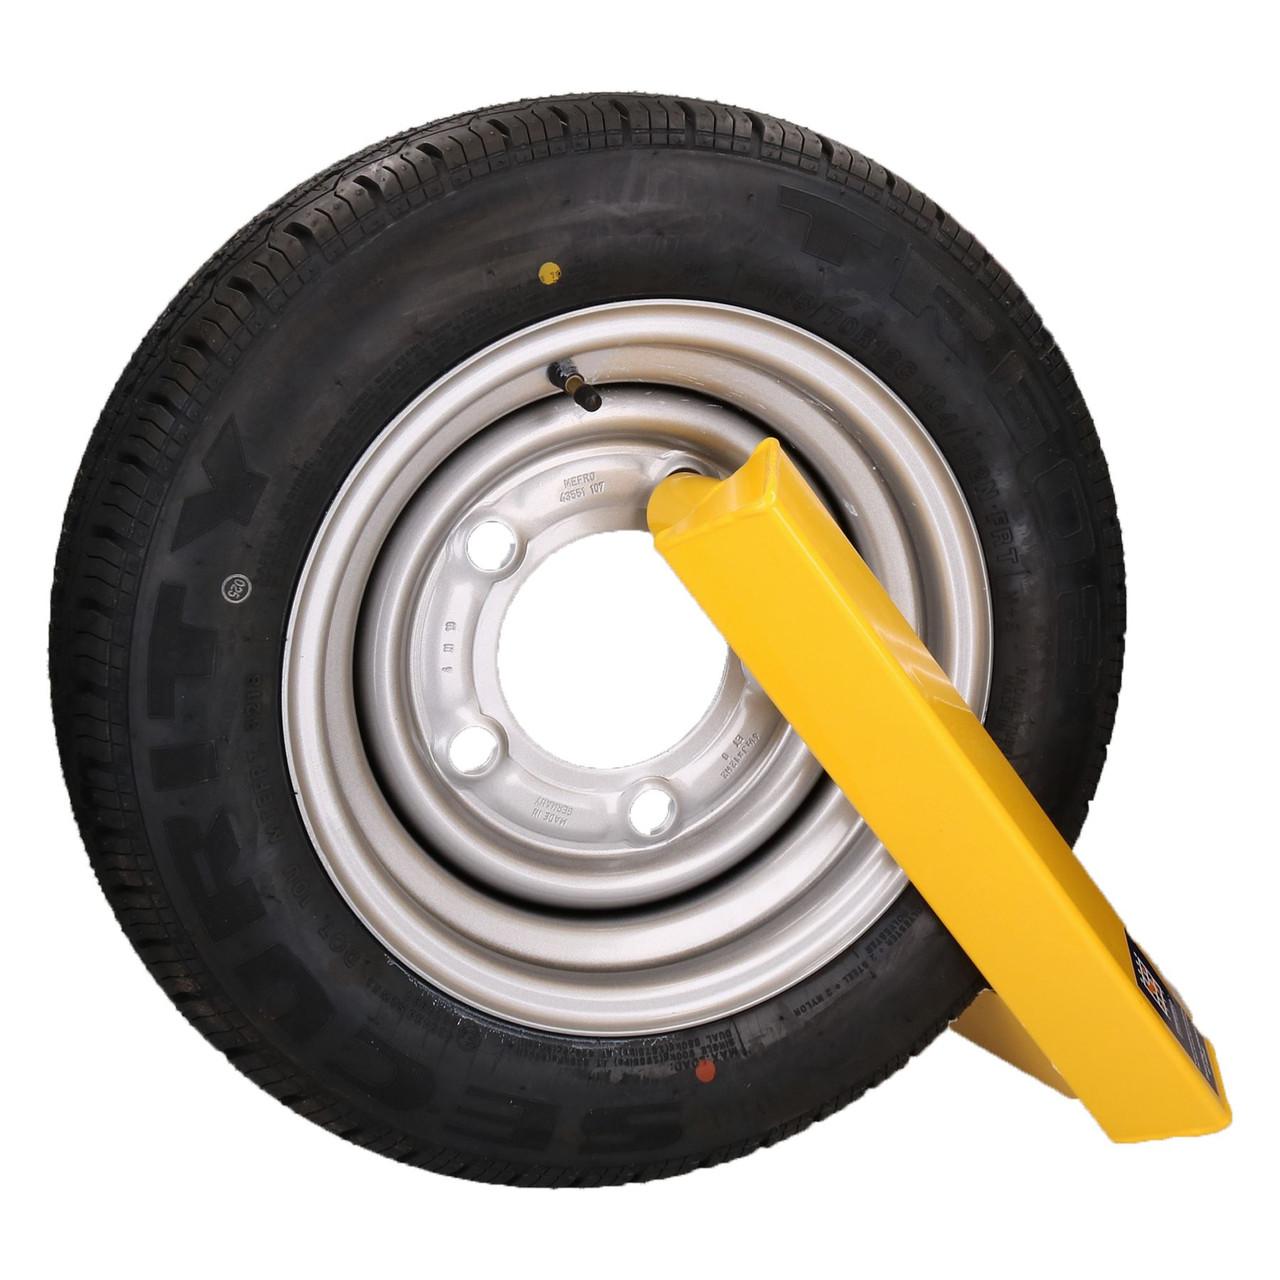 "Wheel Clamp Trailer Caravan Security Lock 12"" 13"" 14"" Insurance Approved"